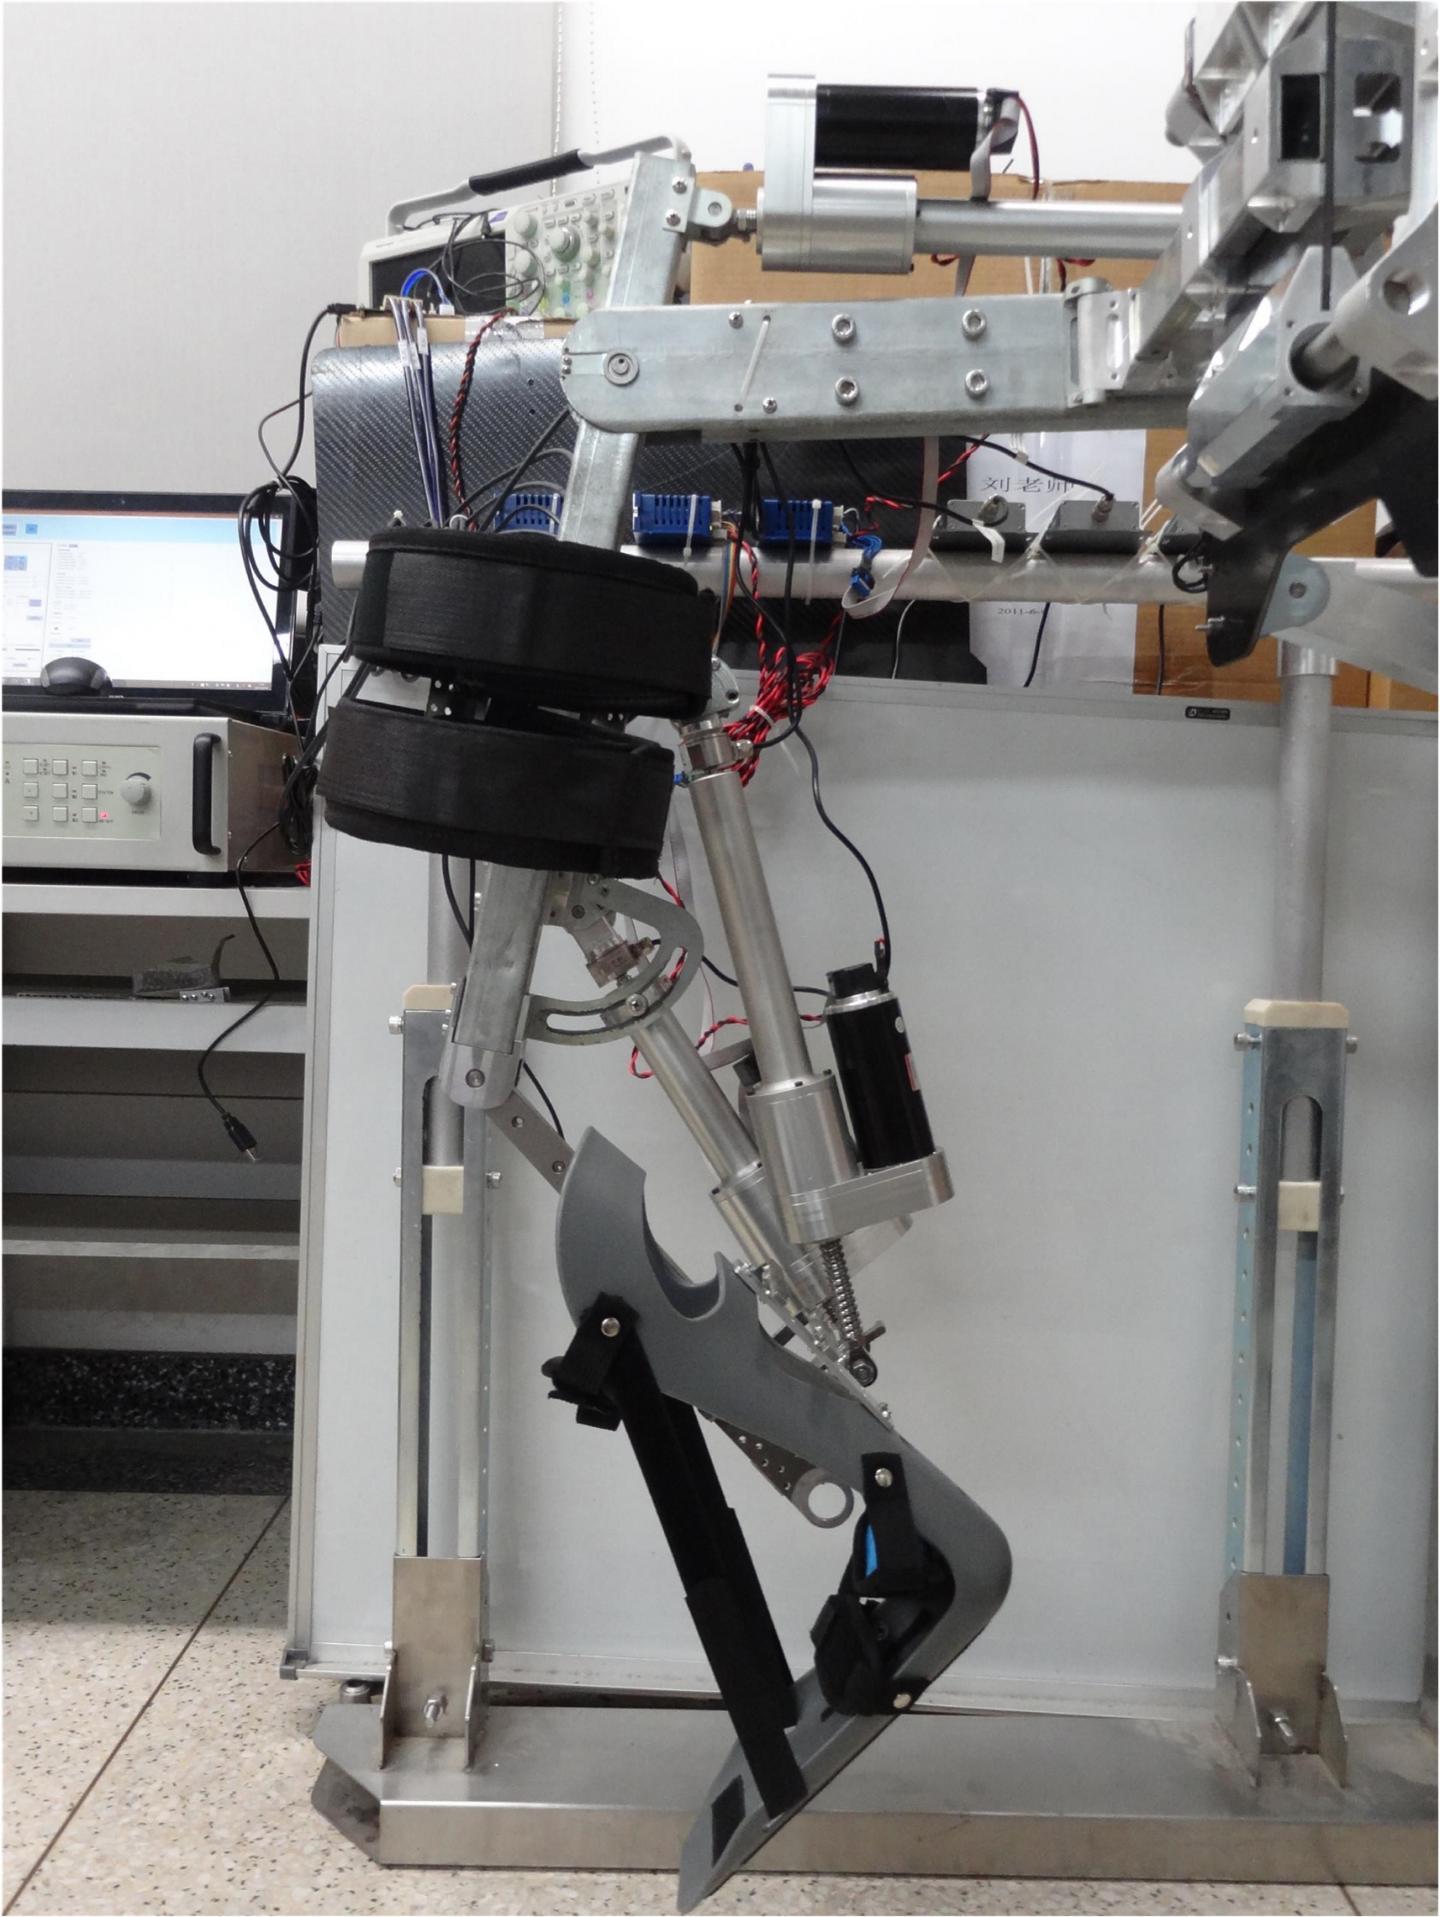 [WEB SITE] Bio-inspired lower-limb 'wearing robotic exoskeleton' for human gait rehab